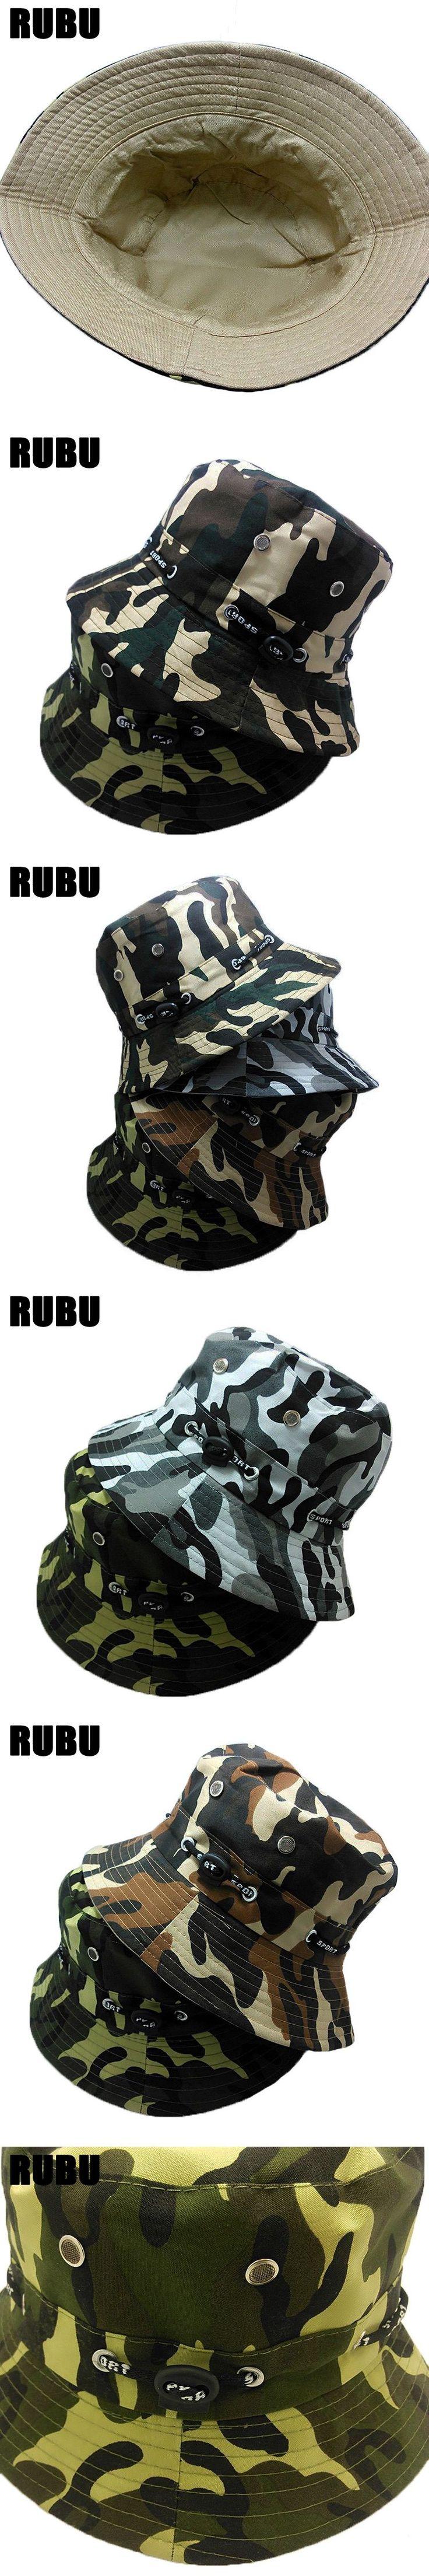 Fashion Camo Bucket Hat Men Military Cap More Color Camo Bucket Hat For Women Sun Protection Fisherman Hat Summer Sun Caps #MilitaryHatsForWomen